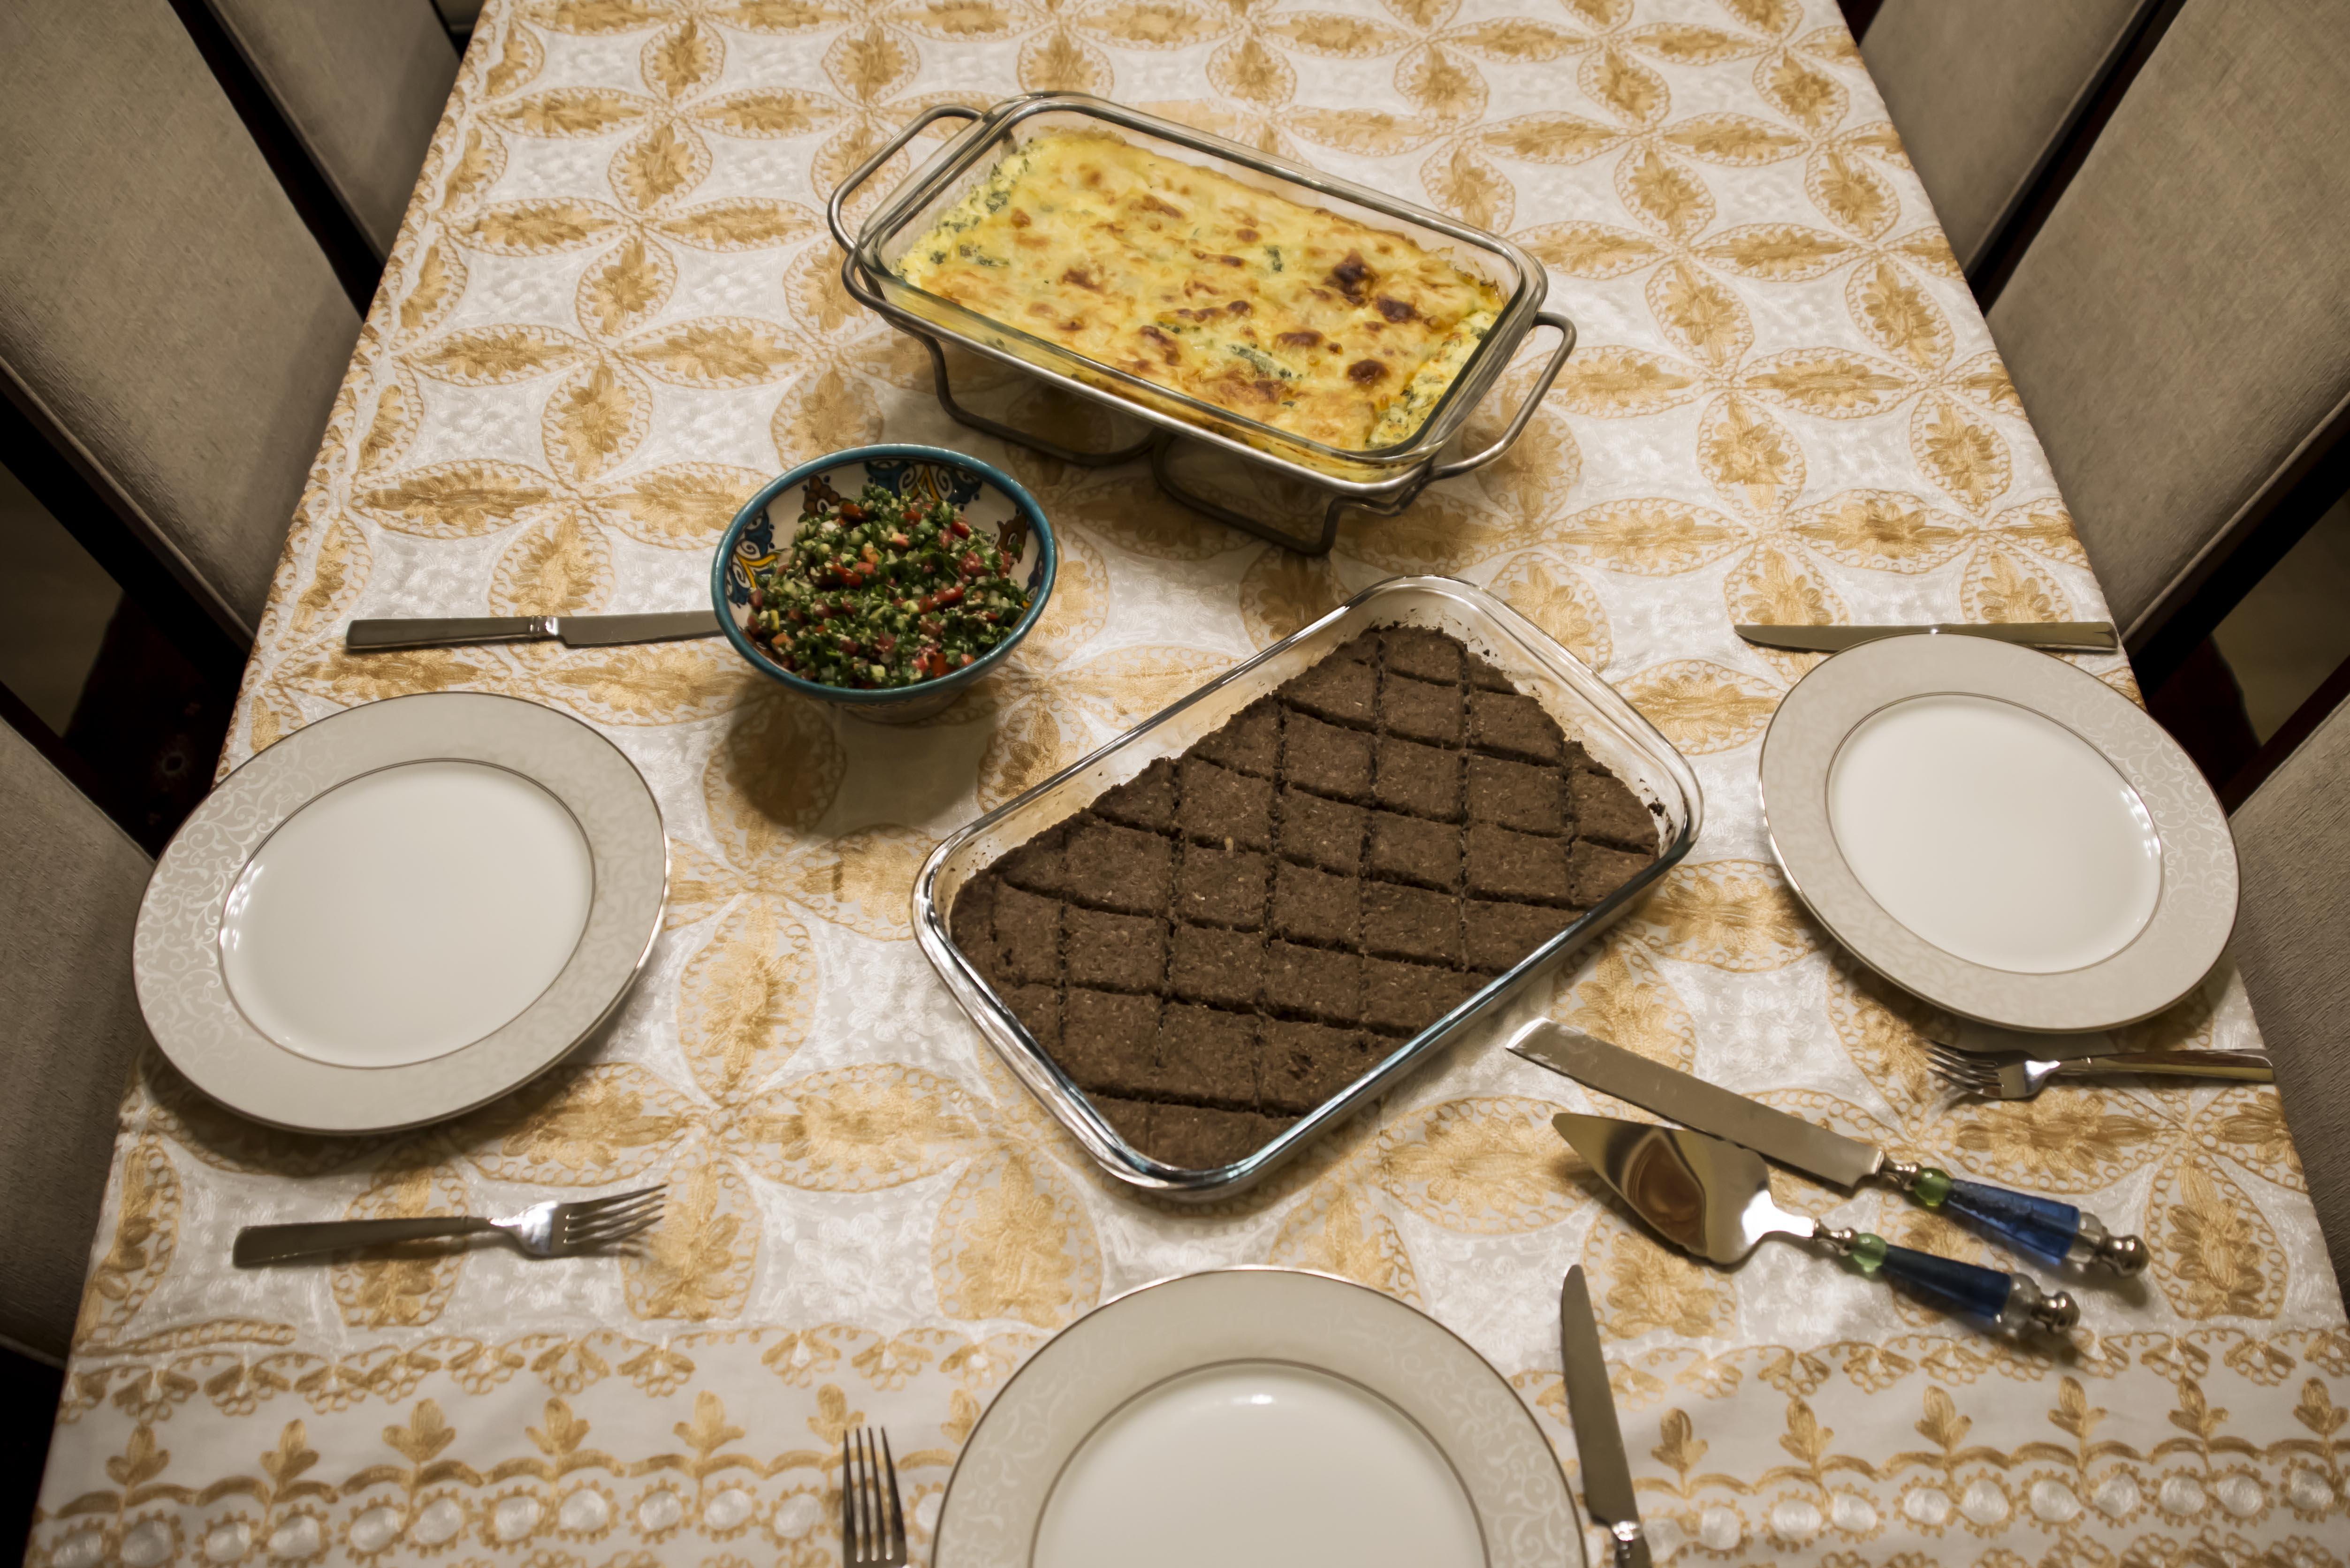 The Syrian Kitchen